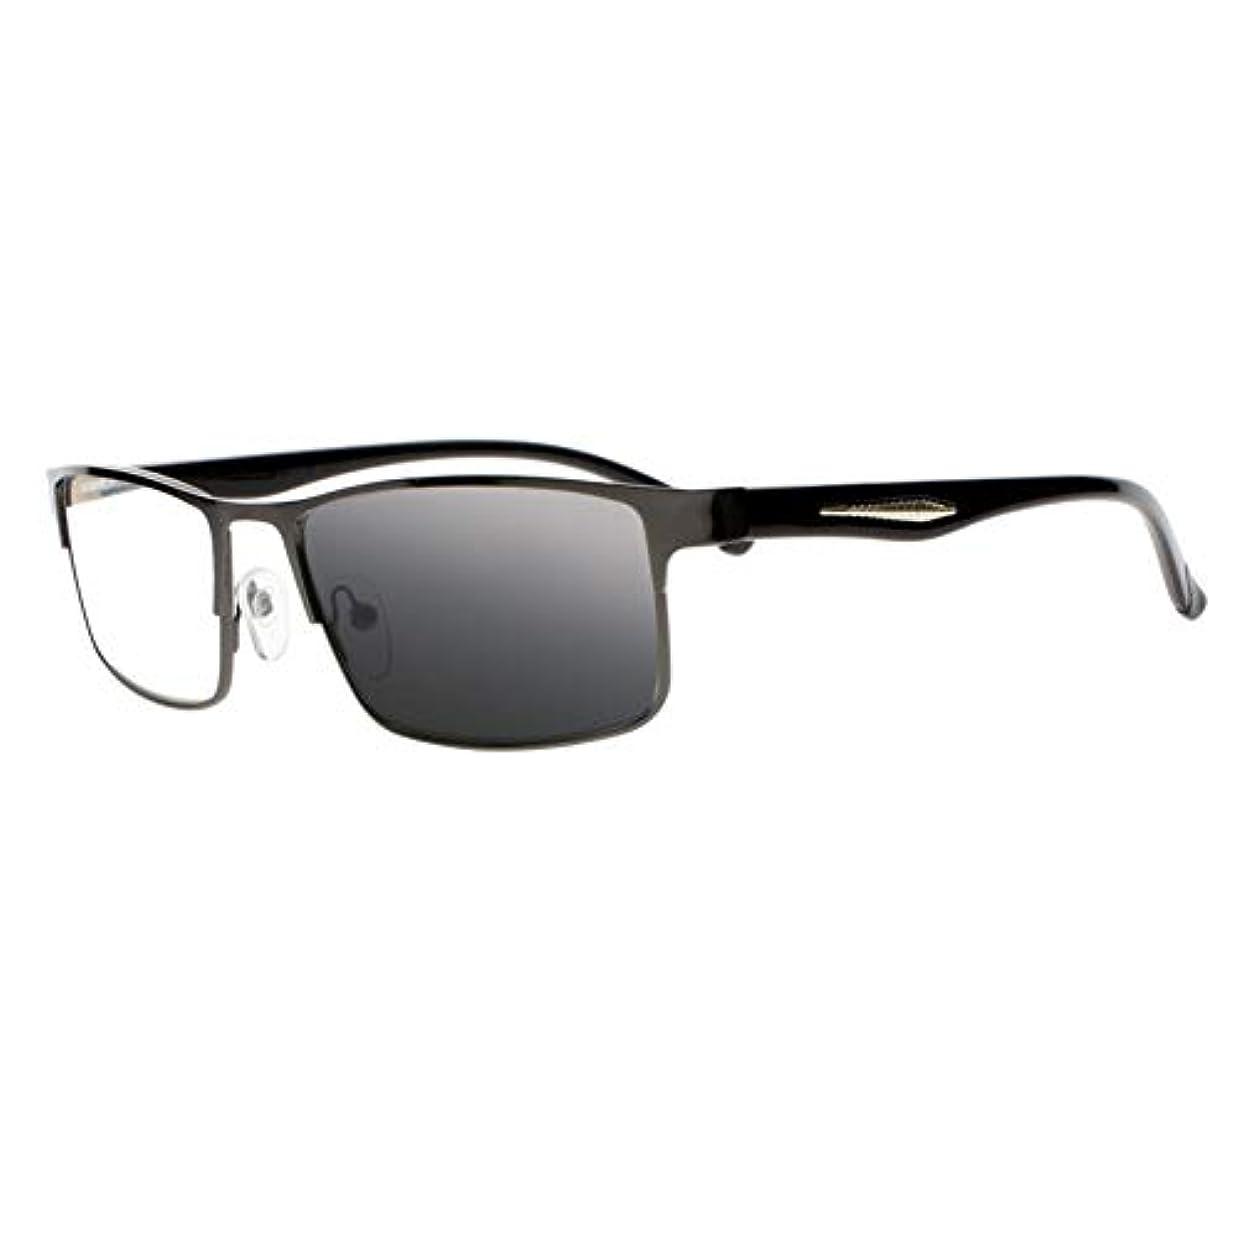 FidgetGear 男性トランジションフォトクロミックオタクオタク老眼鏡サングラス+ 1.0?+ 4.0 UV400 ブラック